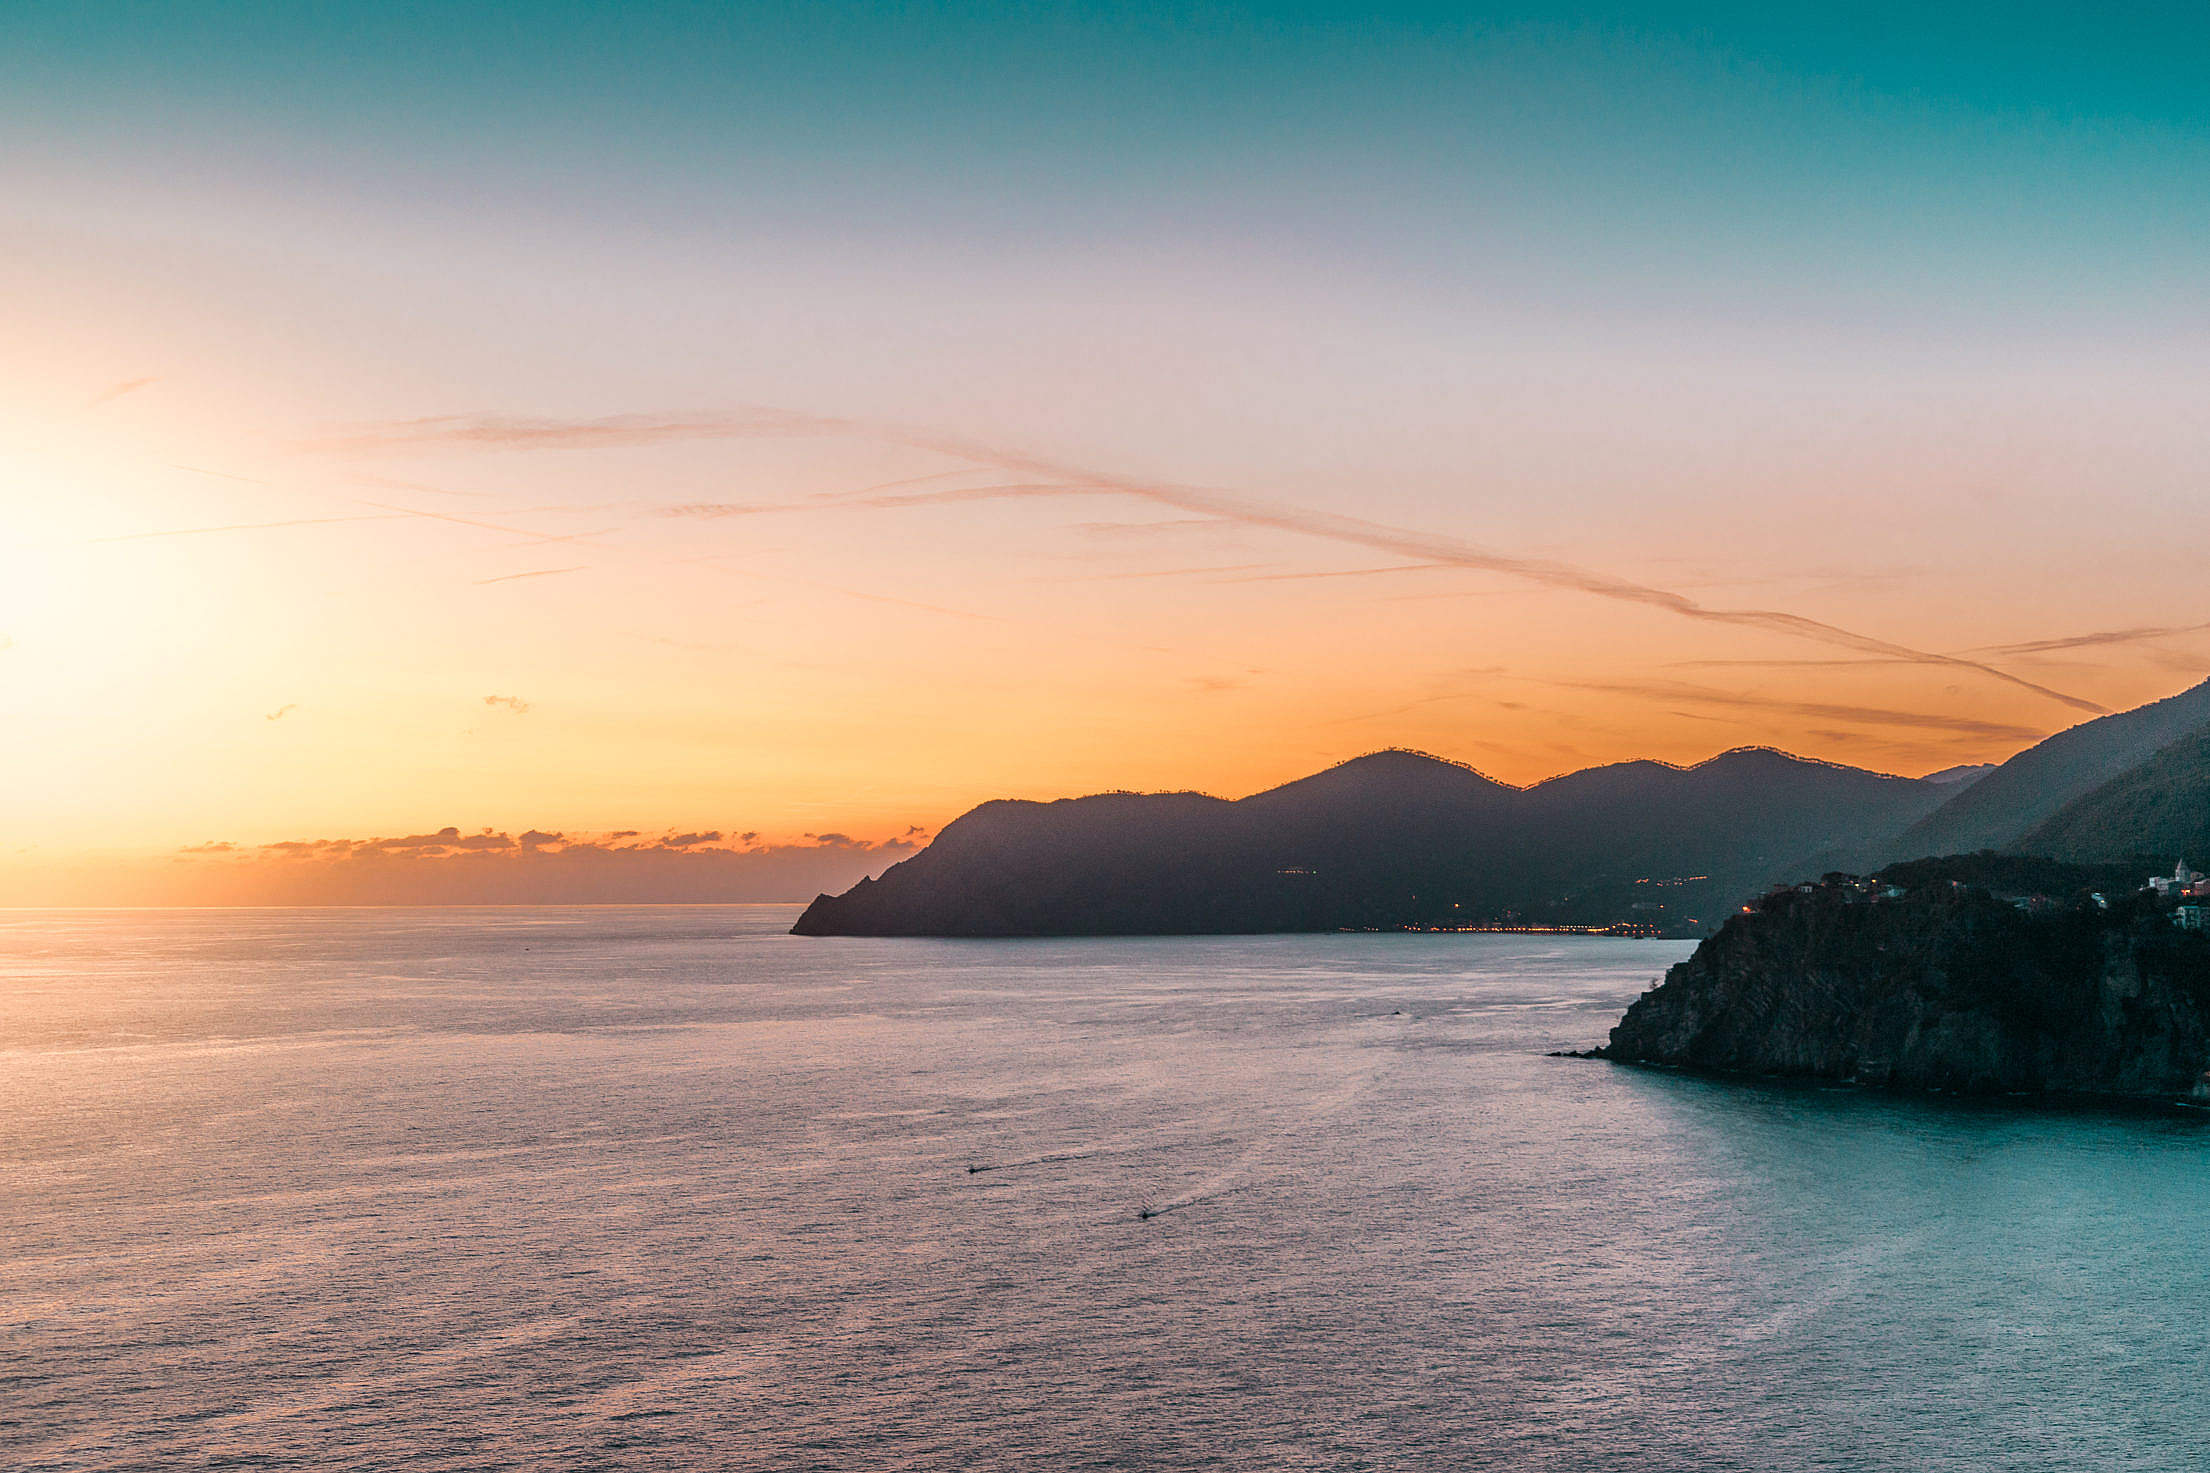 sunset-coastline-free-photo-DSC04245-2210x1473[1].jpg